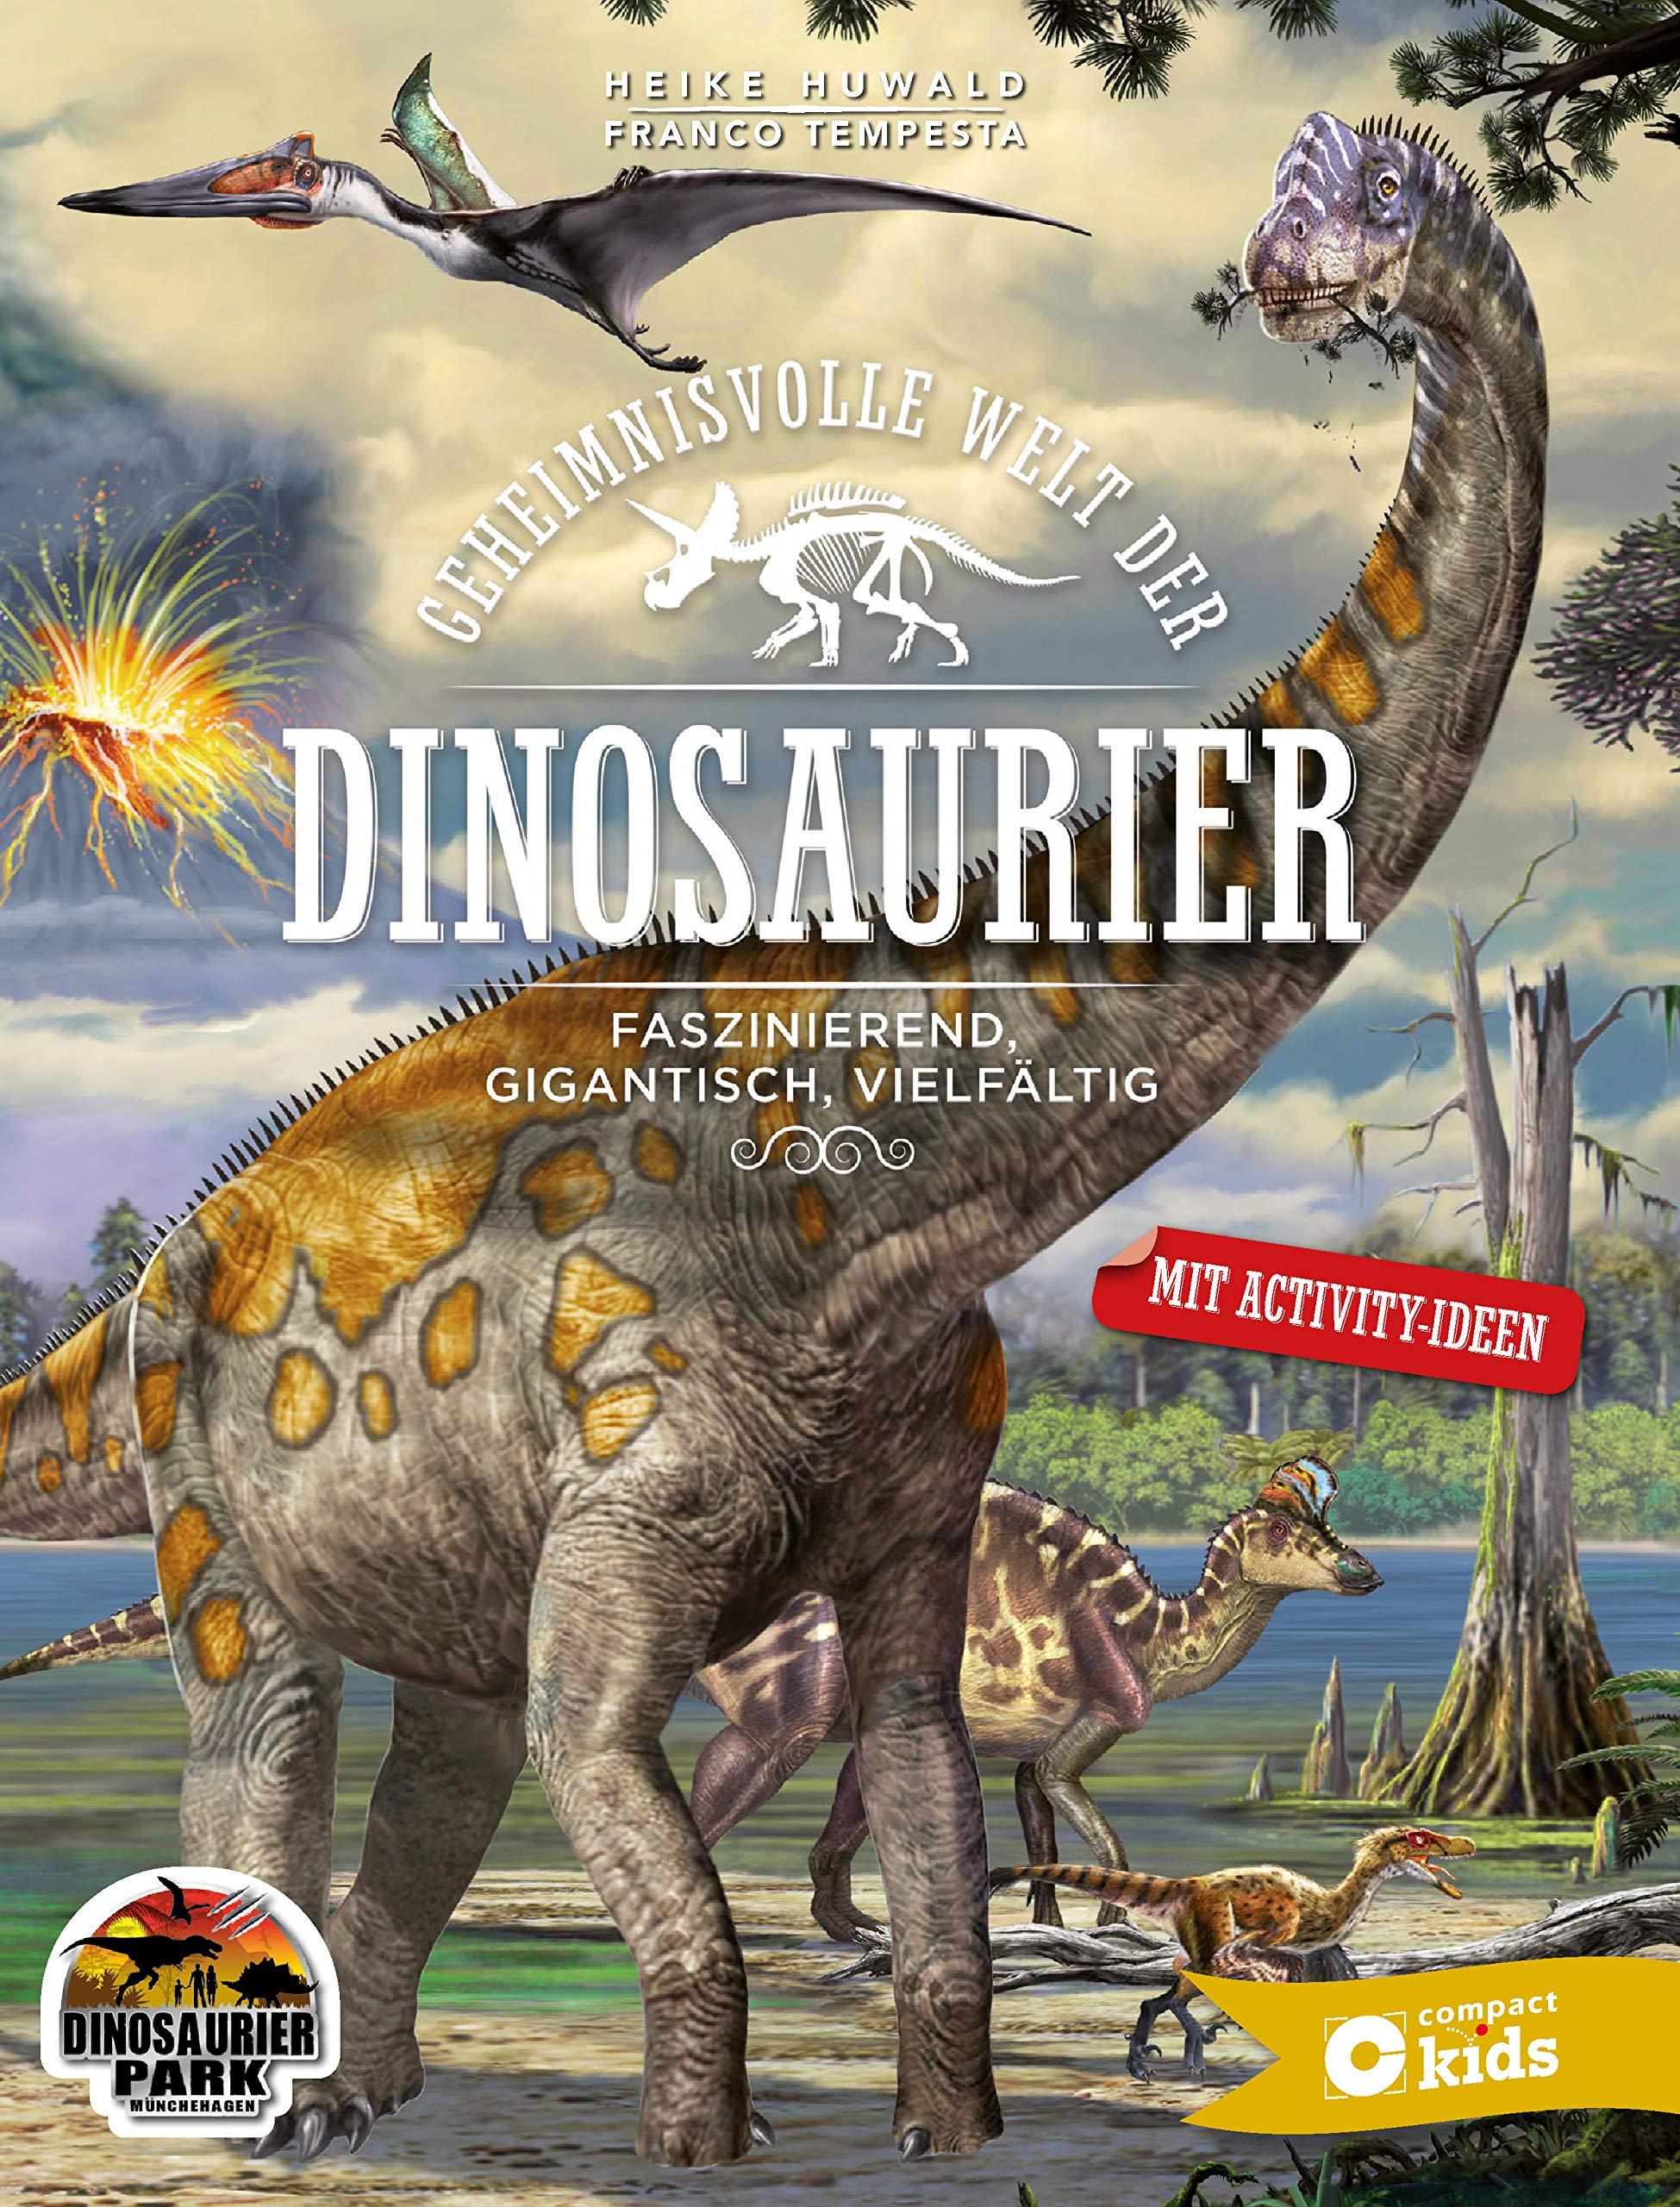 Größter dinosaurier park der welt